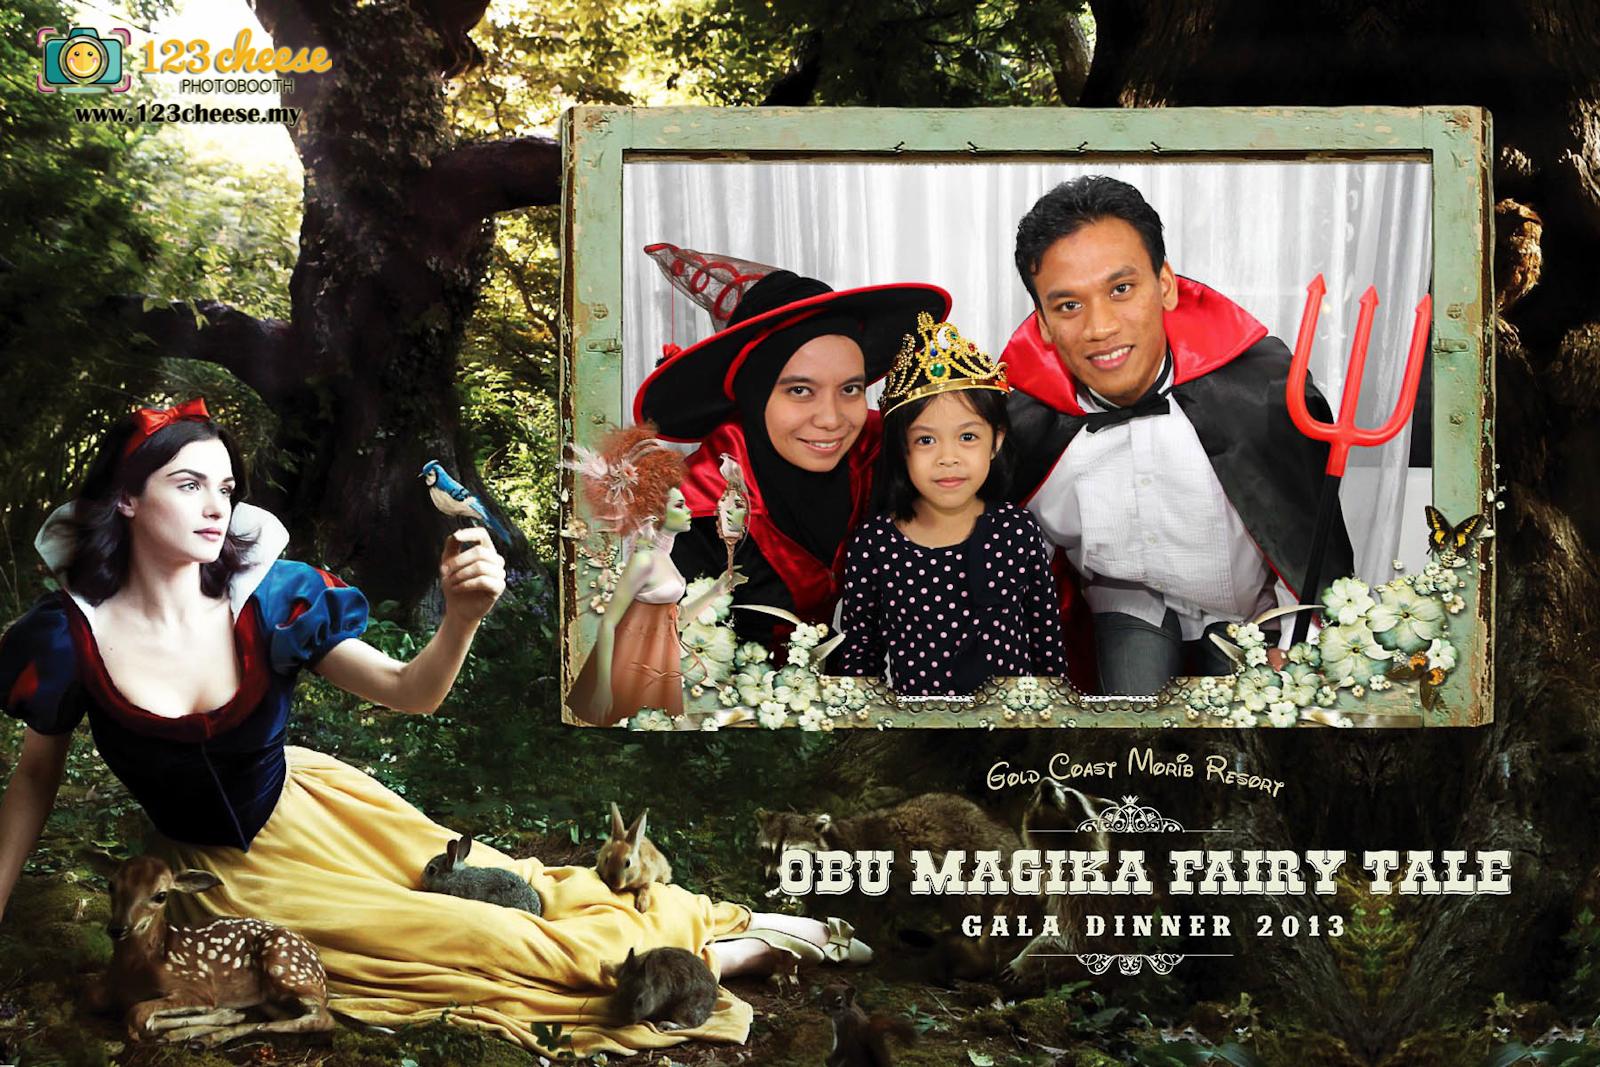 OBU Magika Fairy Tale Gala Dinner 2013